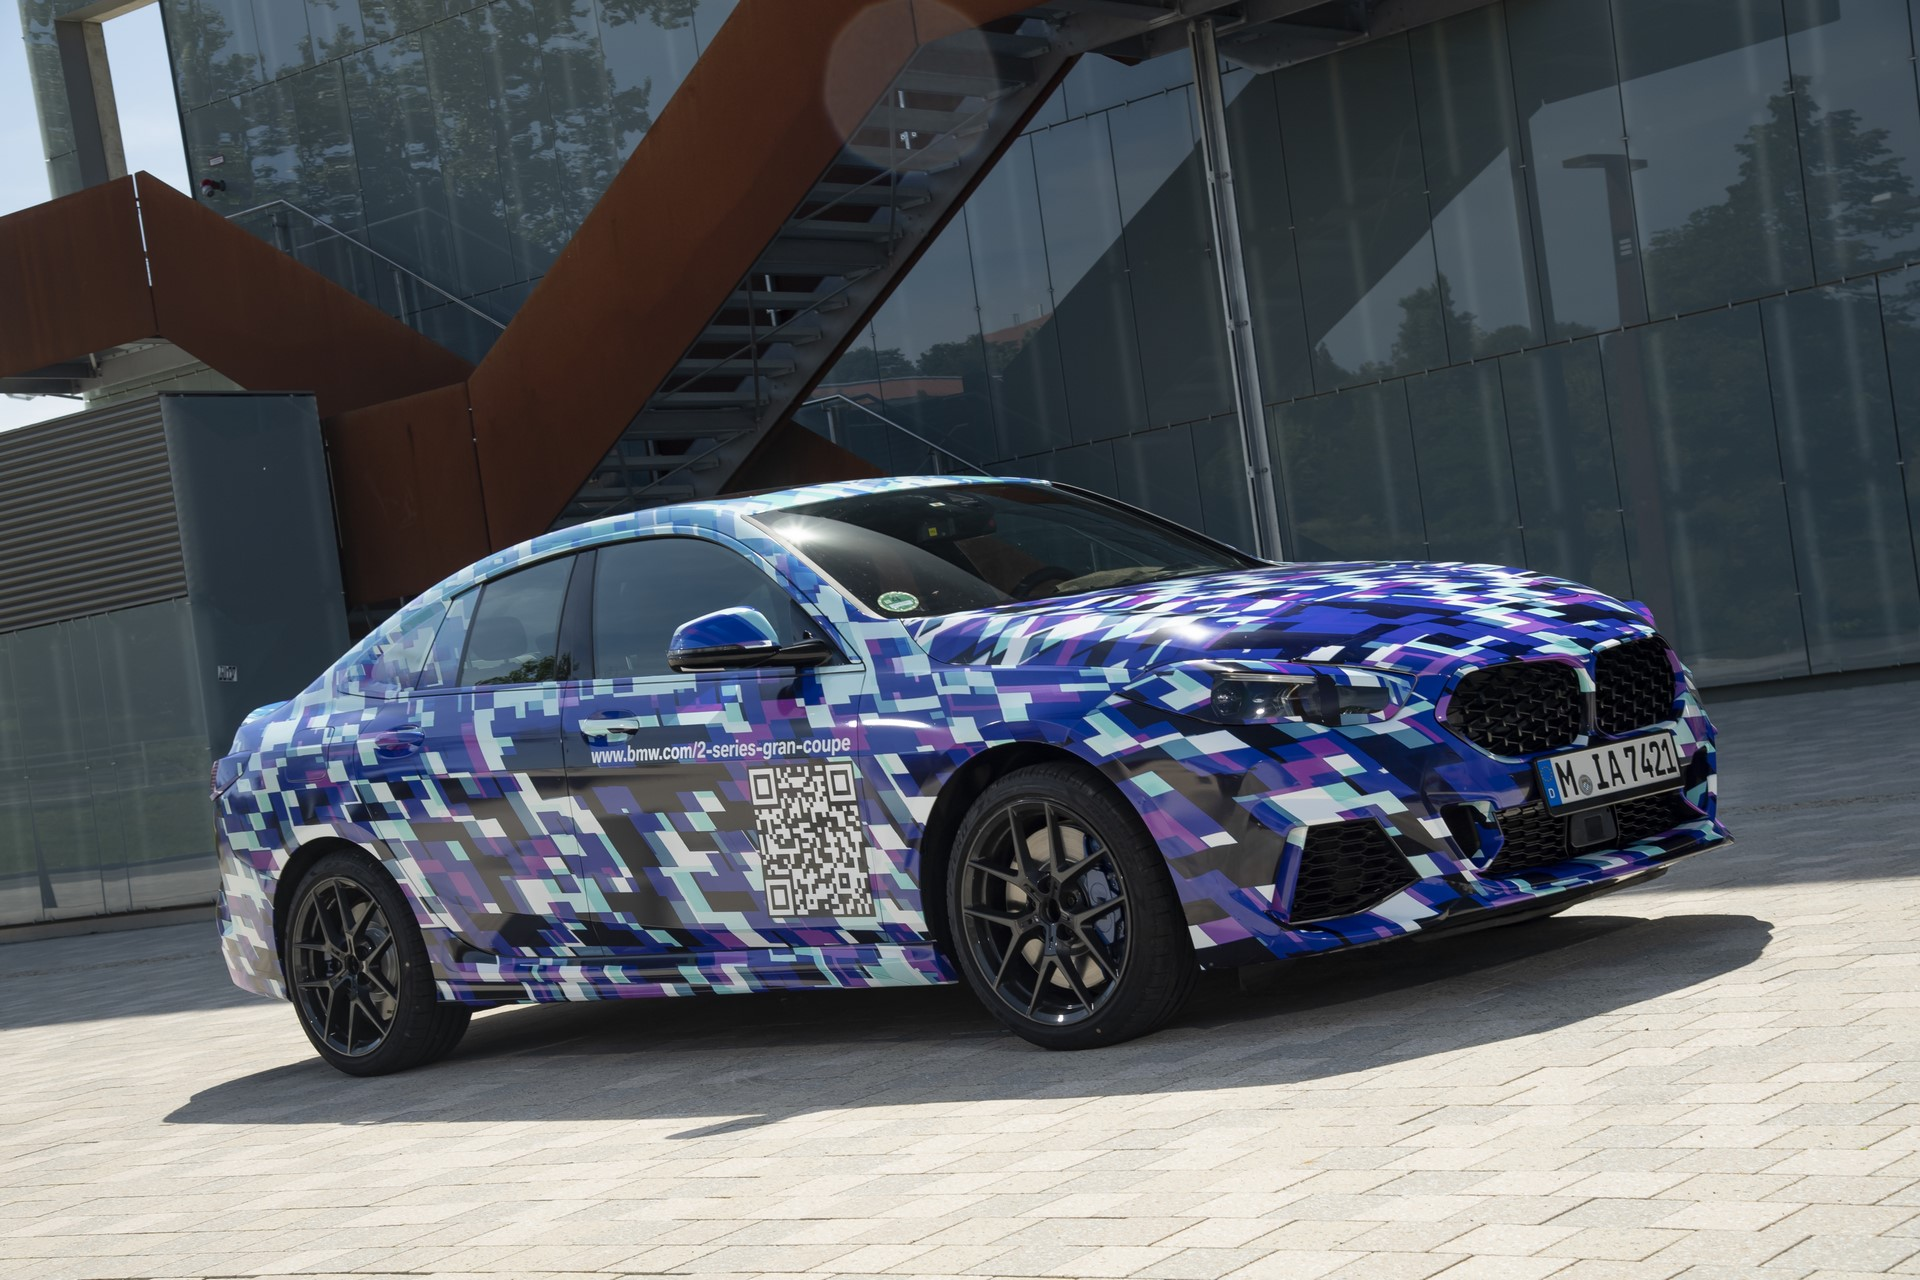 BMW-2-Series-Gran-Coupe-2020-spy-photos-20